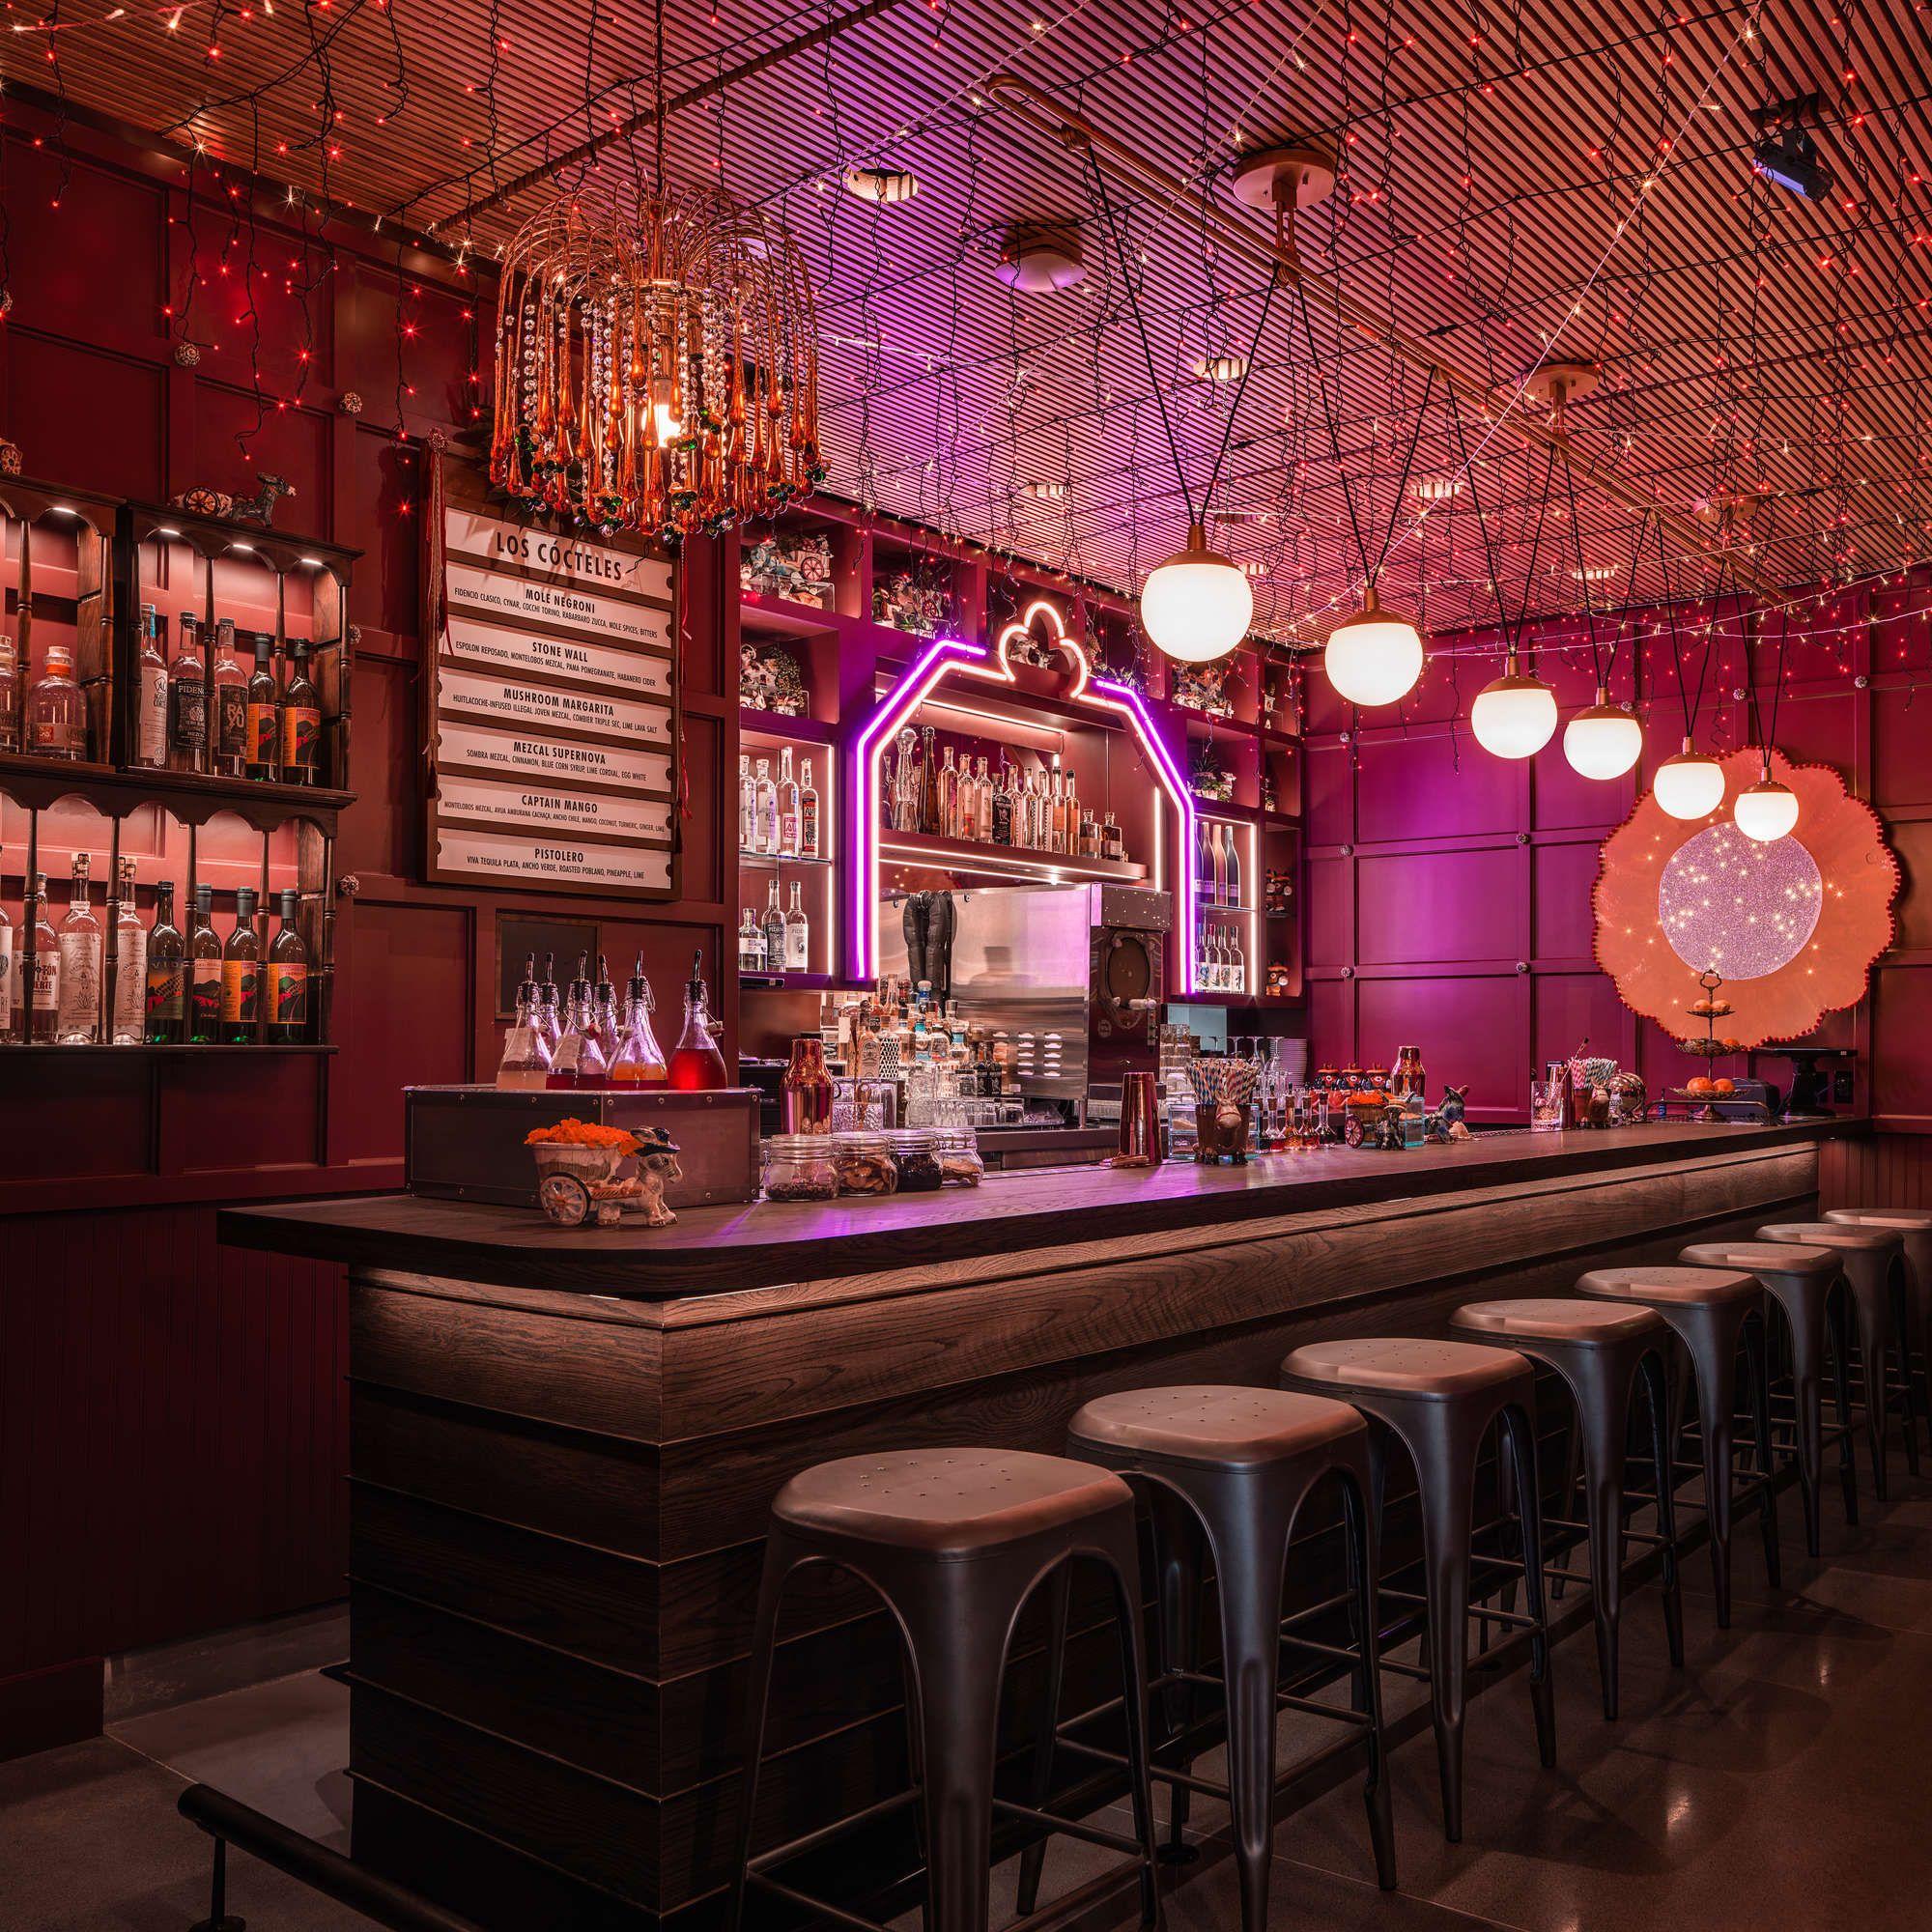 Agave Cocktails At Ghost Donkey Las Vegas An Offshoot Of Nacho Jimenez S New York Tequila And Mezcal Bar Cosmopolitan Las Vegas Hidden Bar Las Vegas Dining